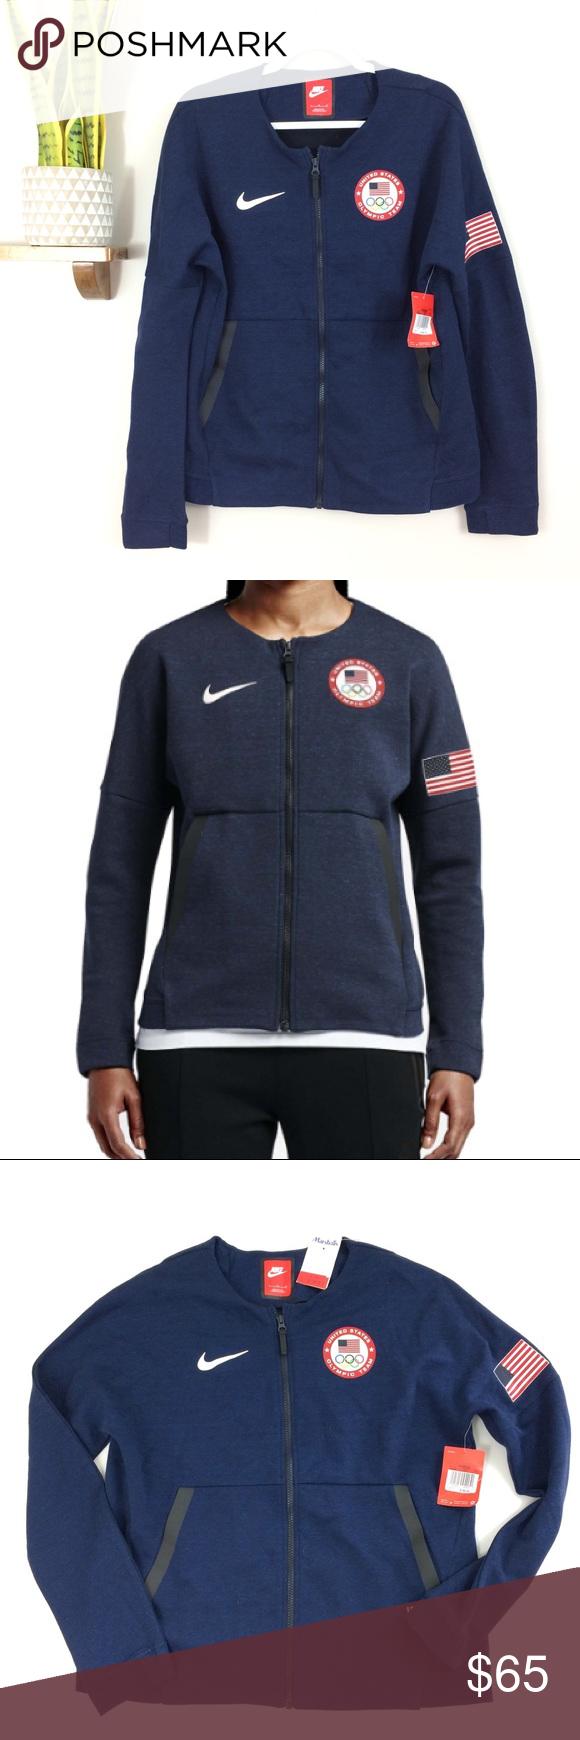 "Nike Tech USA Olympic Full Zip Jacket Navy Nike Tech olympic jacket. Navy  blue color. Full zip style. See measurements below. V ▫️underarm to  underarm 22"" ... fc42e791bedb"